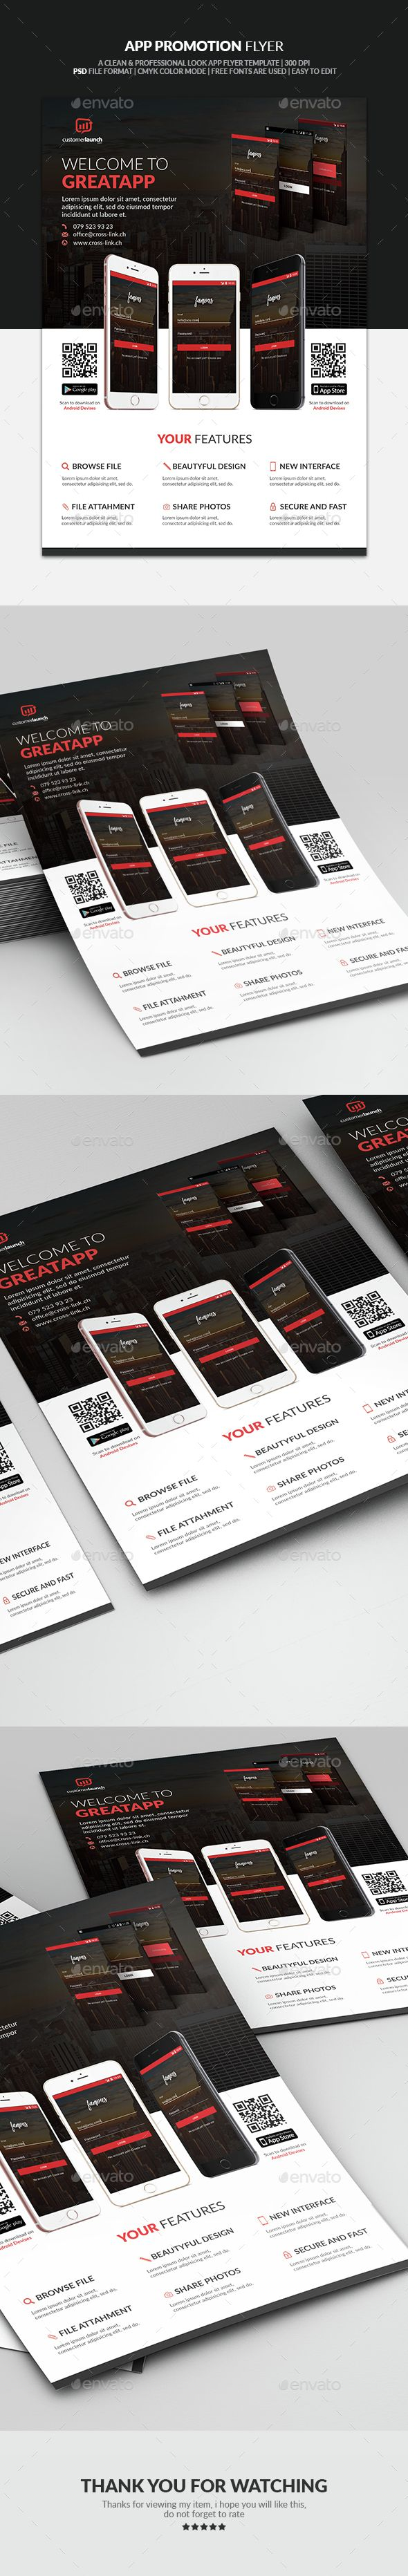 Apps Promotion Flyer 64 best promotion images